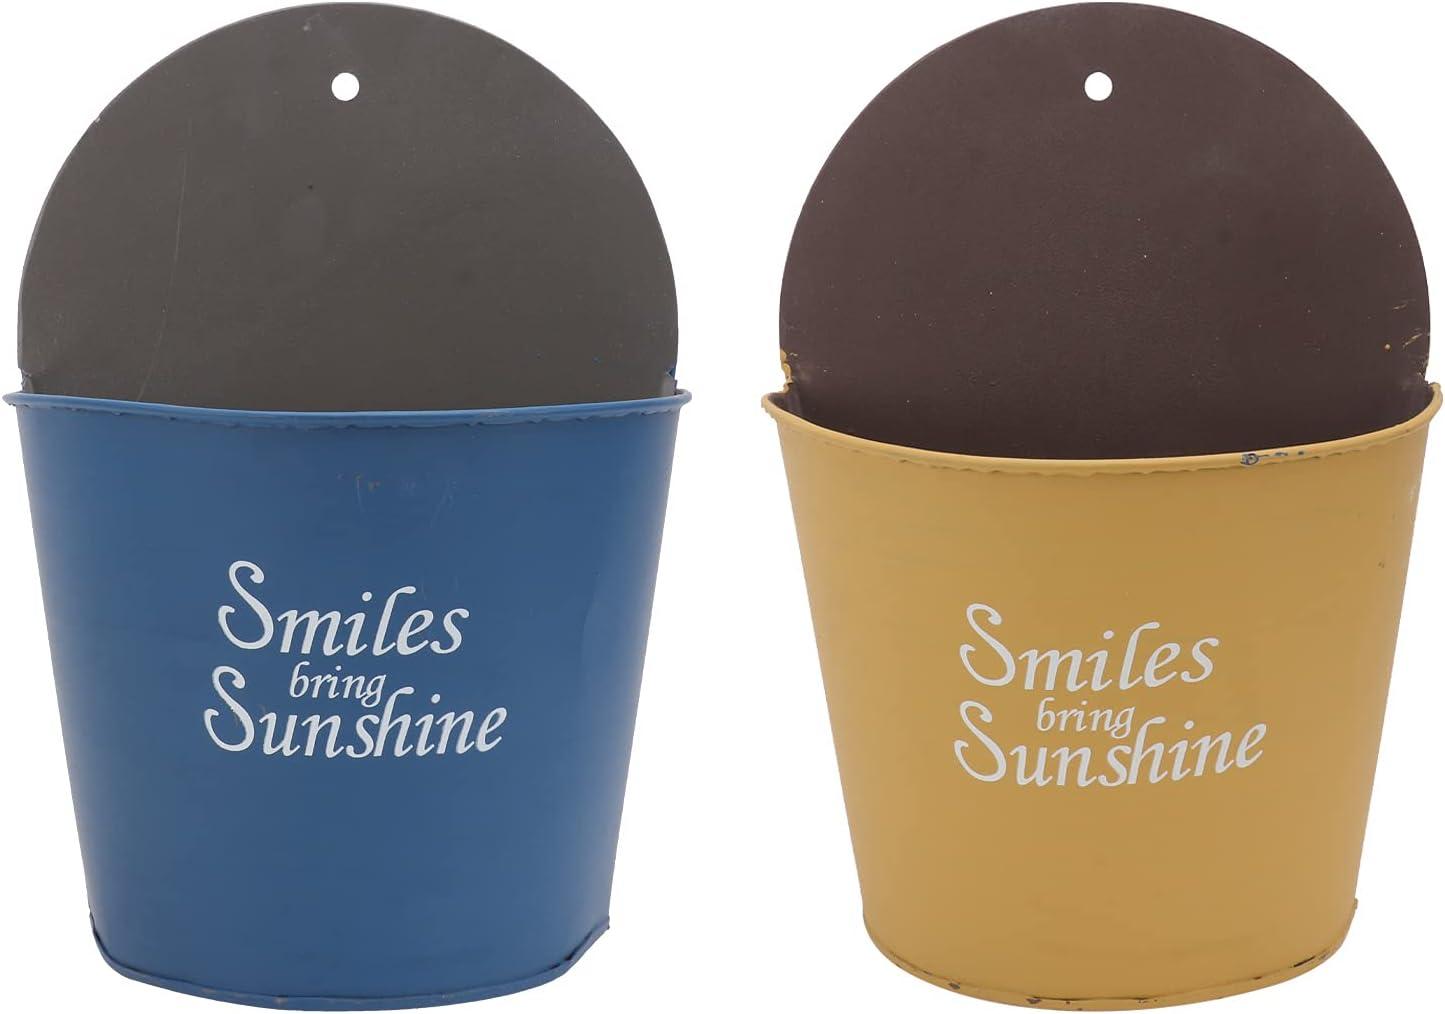 Happyyami 2Pcs Delicate Fashionable Flower Flo Iron Vintage Pots 25% OFF specialty shop